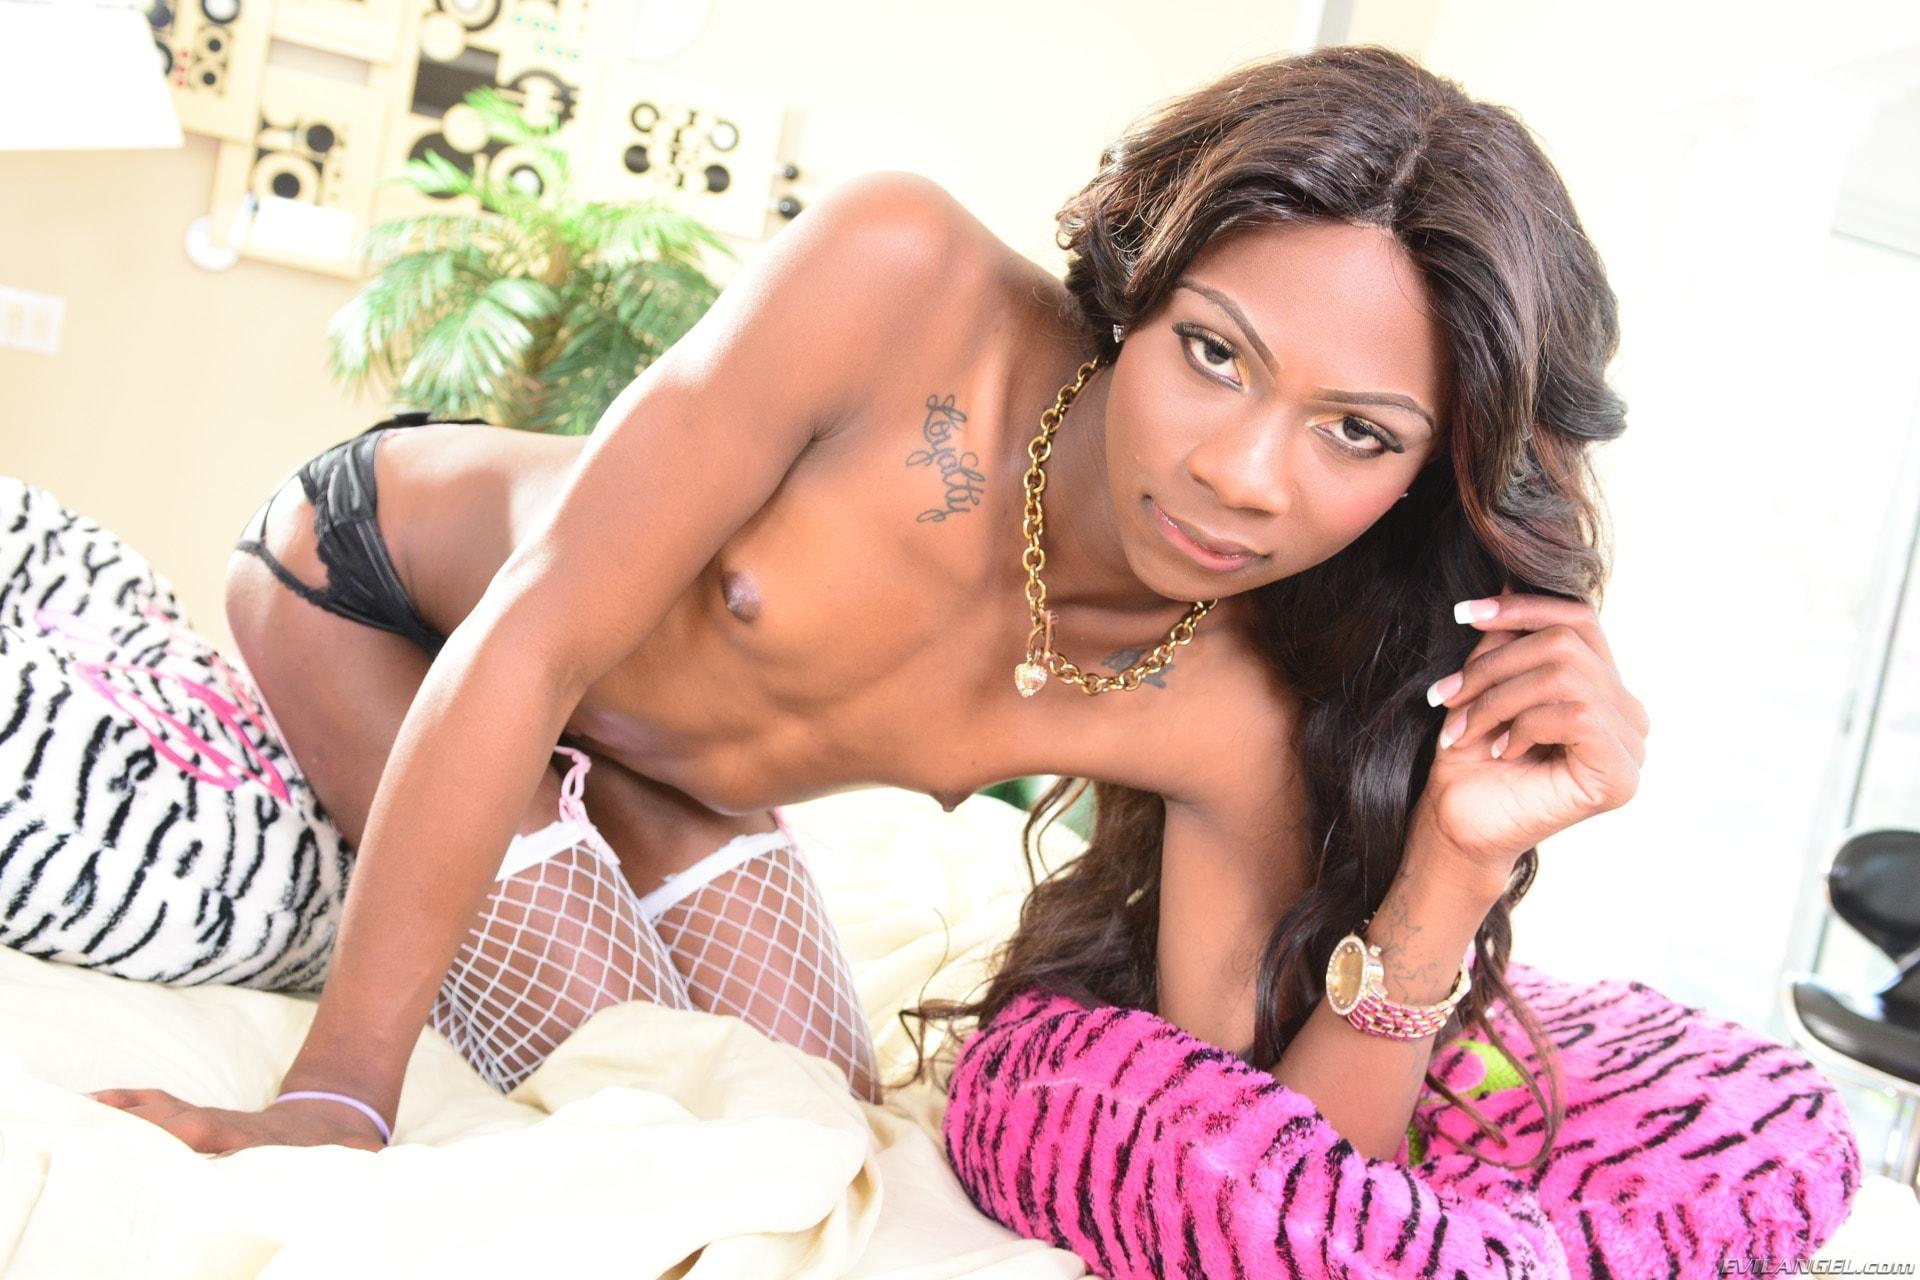 I Love Black Shemales 'The Next She-Male Idol 09' starring Kourtney Dash (Photo 36)